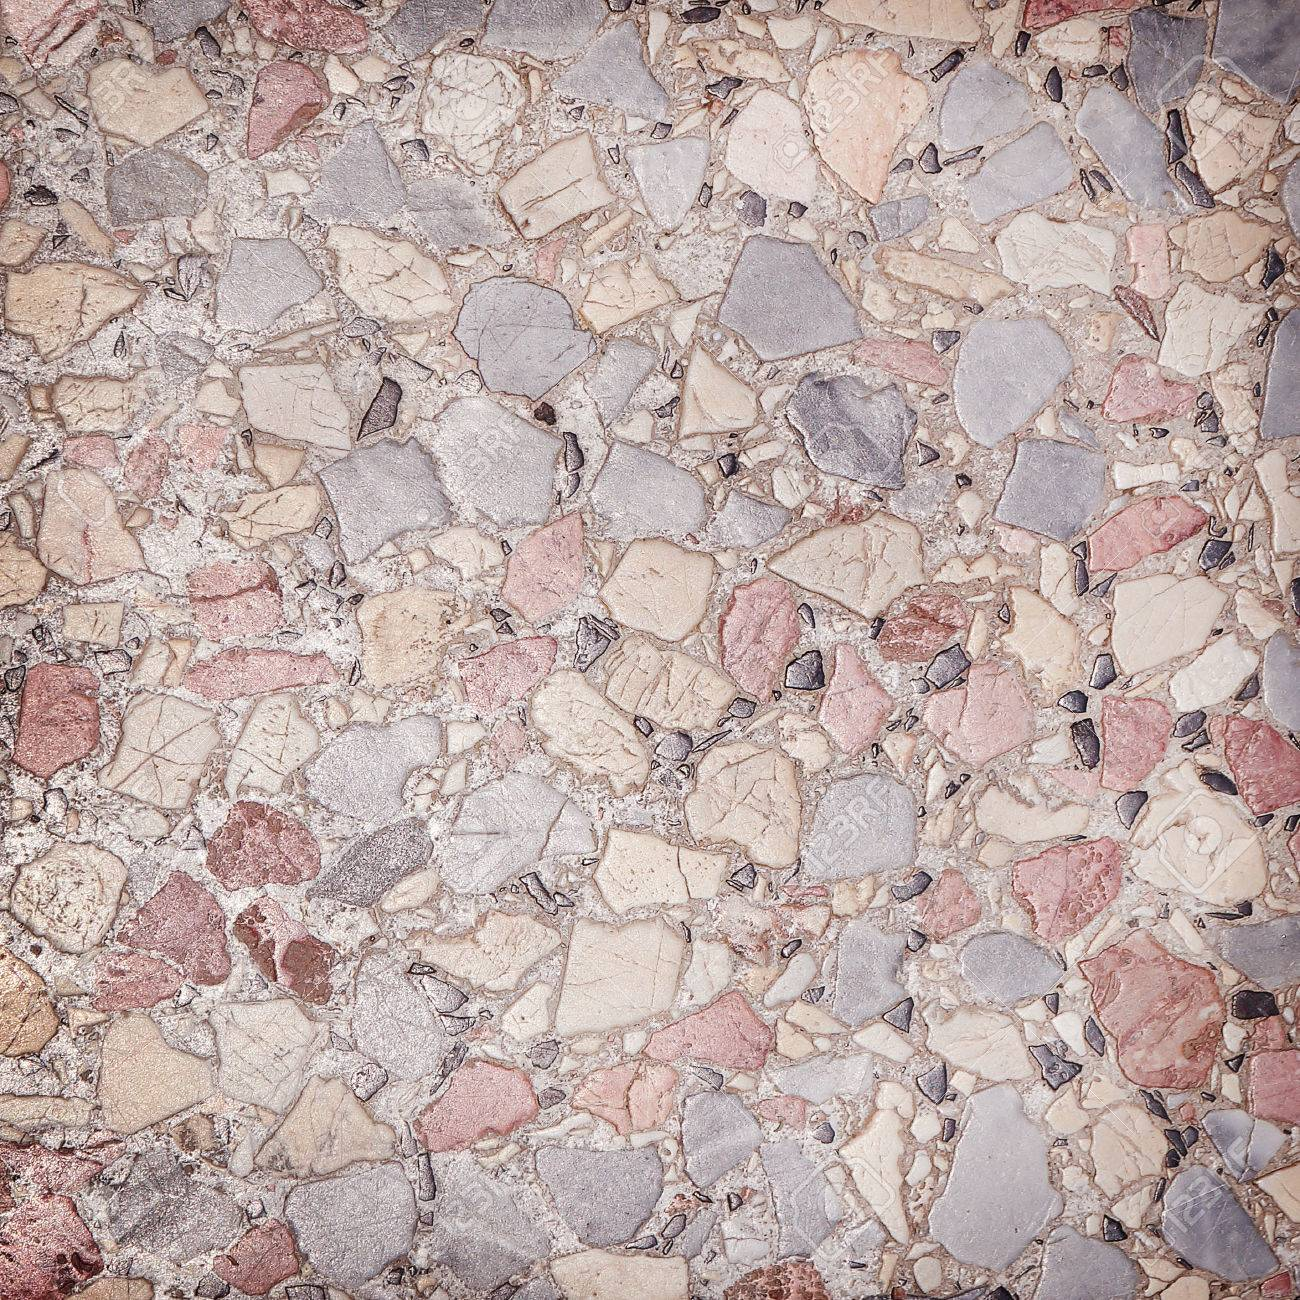 turkey terrazzo buy from tile floor a of s capra ordinary european floors tiles photo manisa x uk